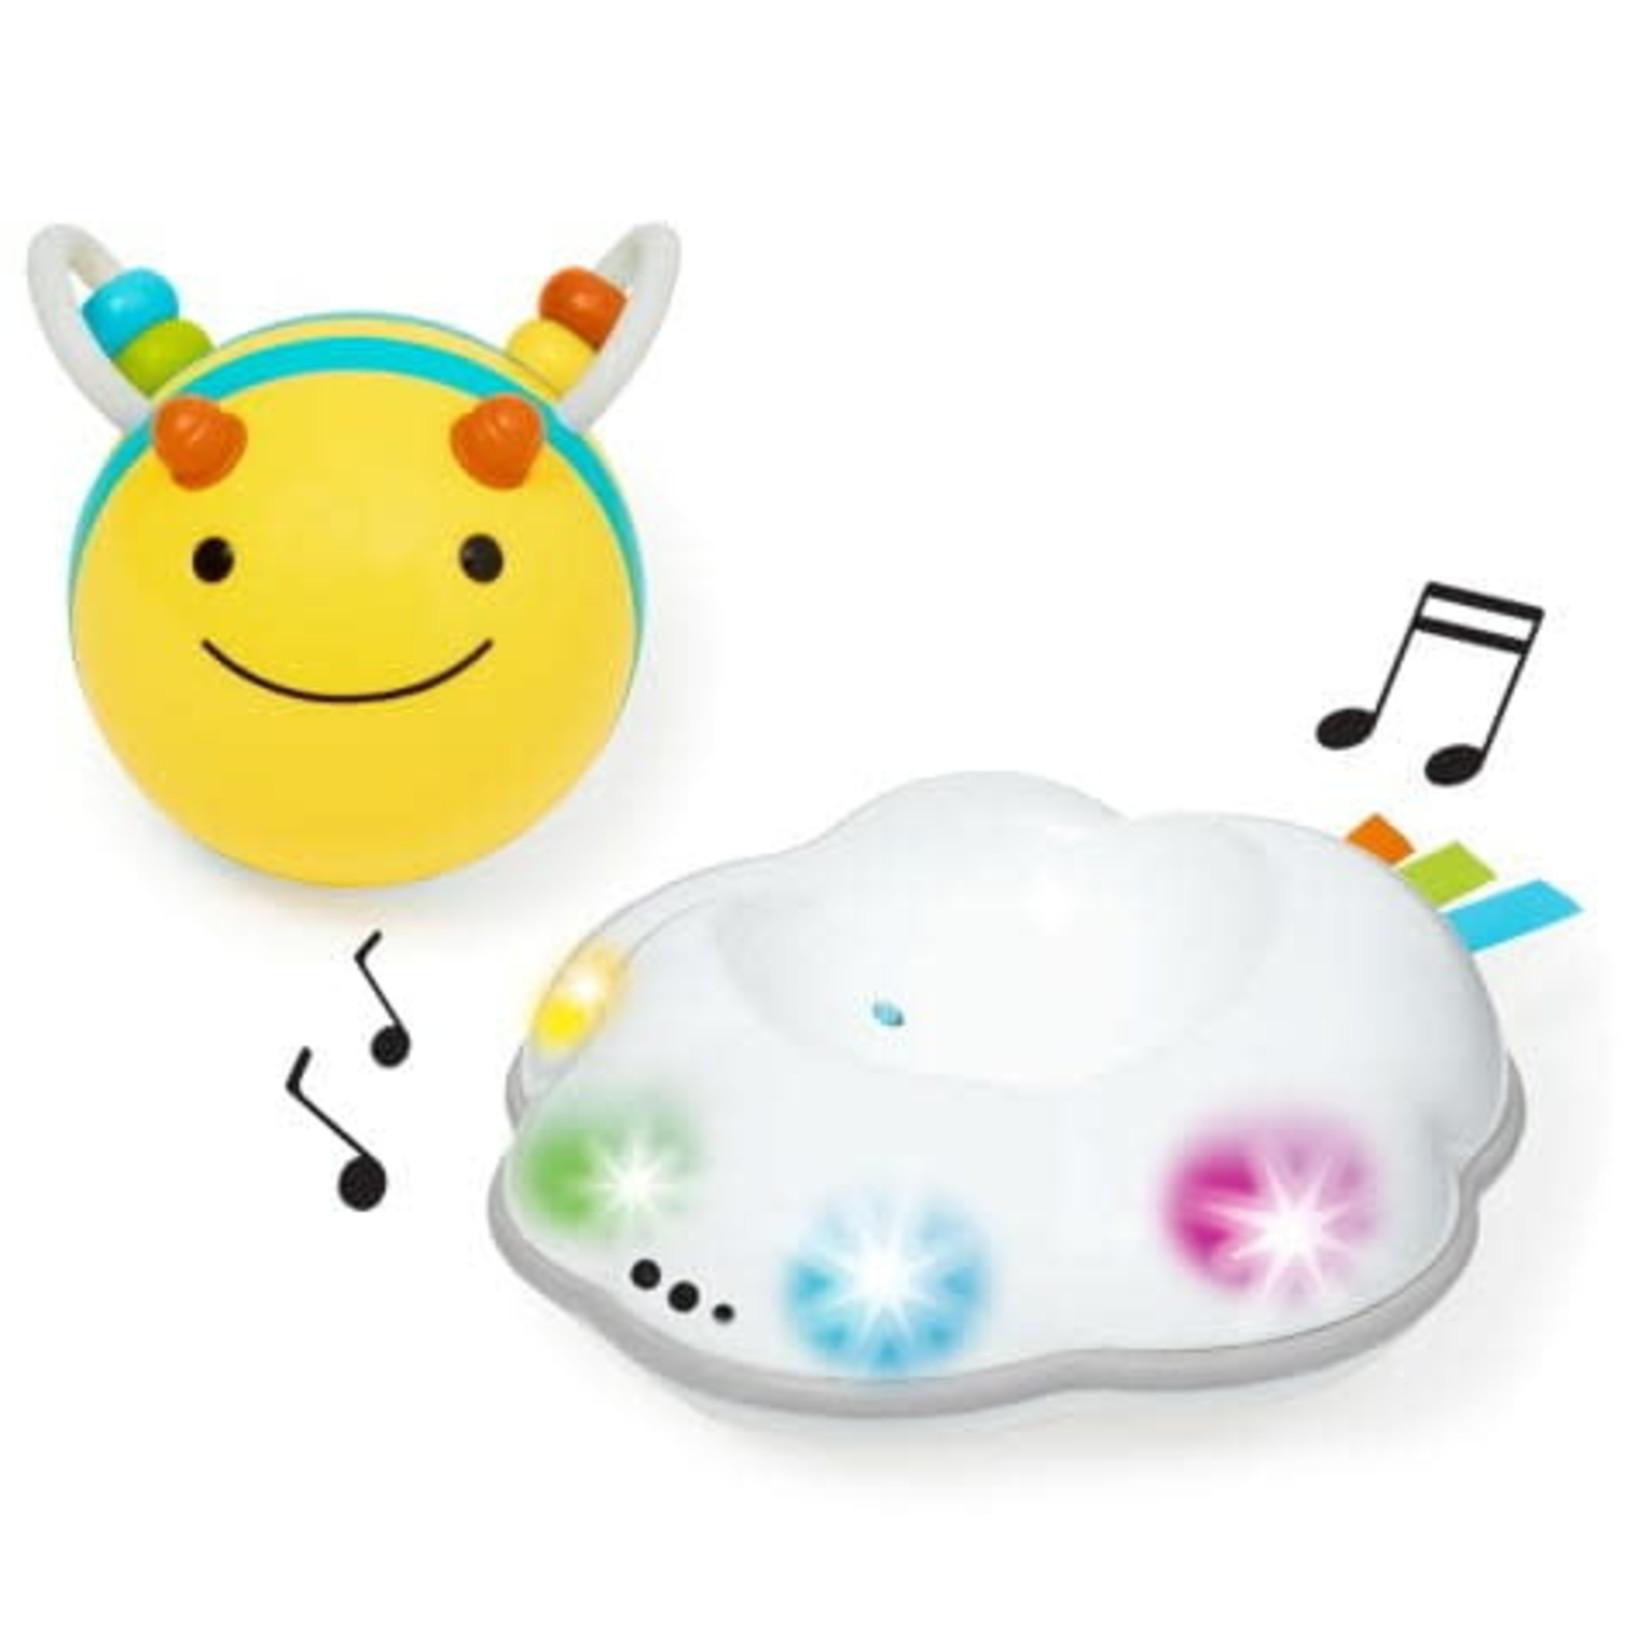 SKIP HOP E&M - Crawl Toy (Baby innovation award)